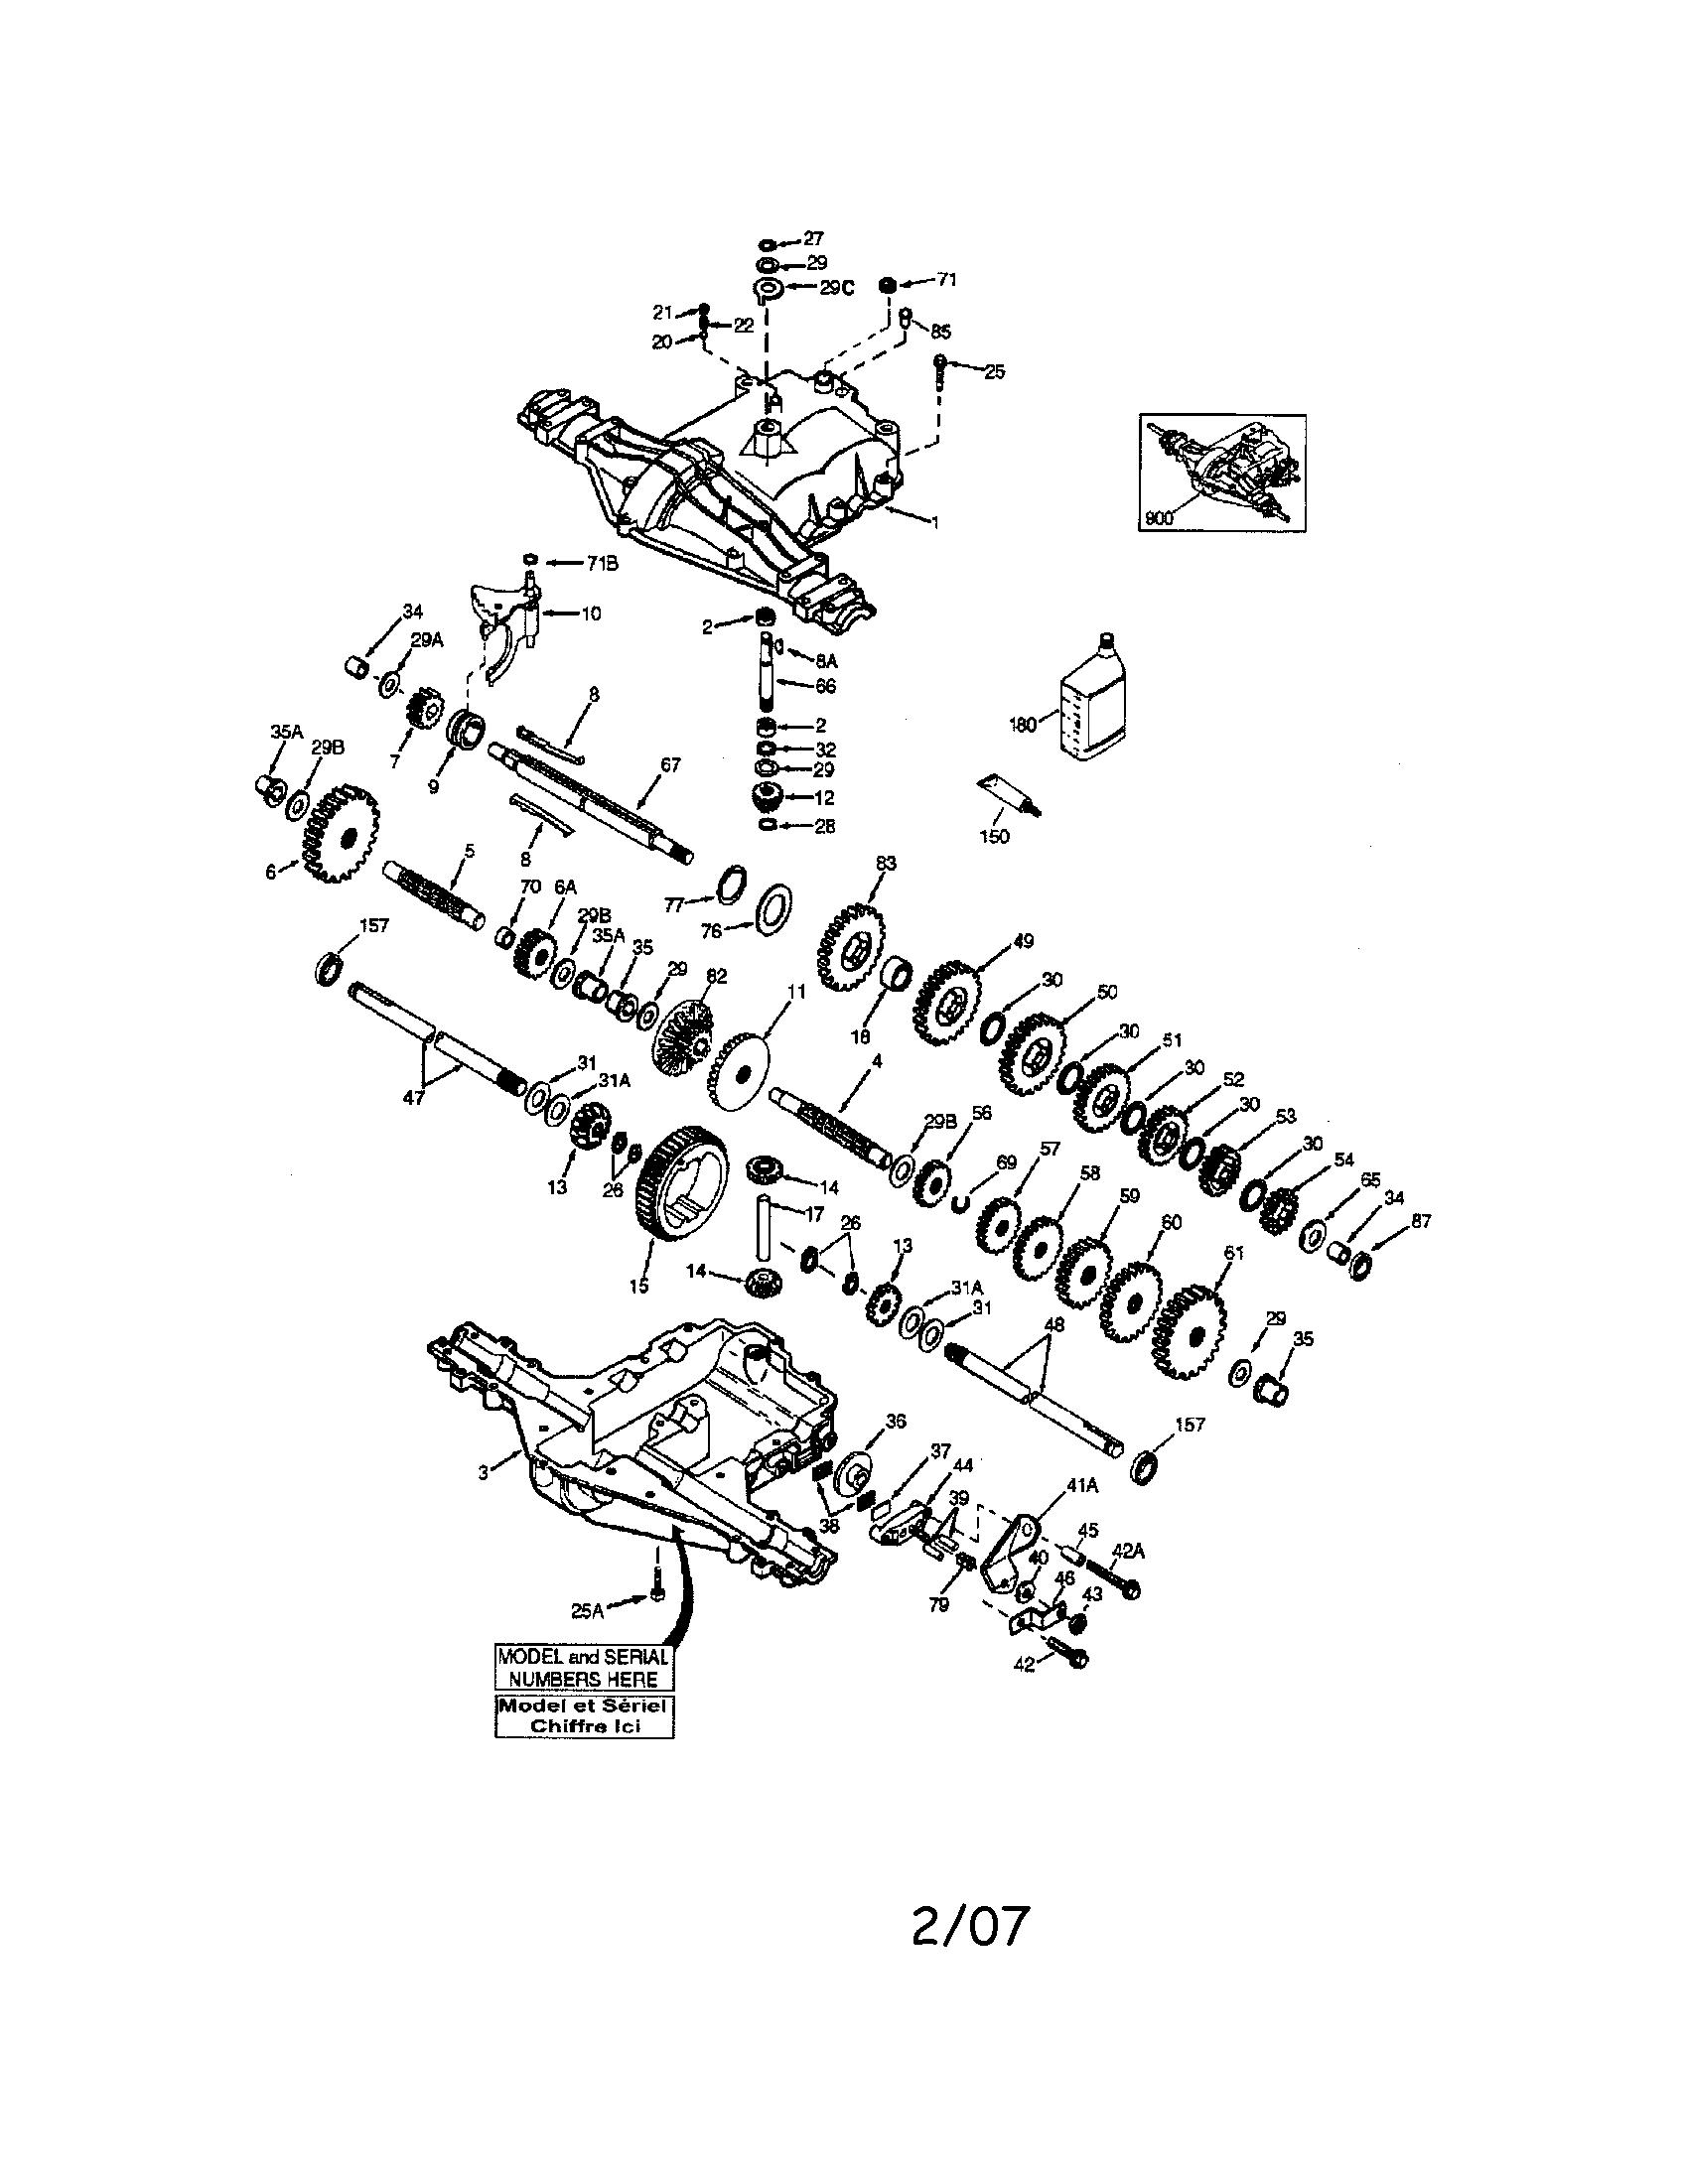 Peerless model 206-545C transaxle/transmission, tractor